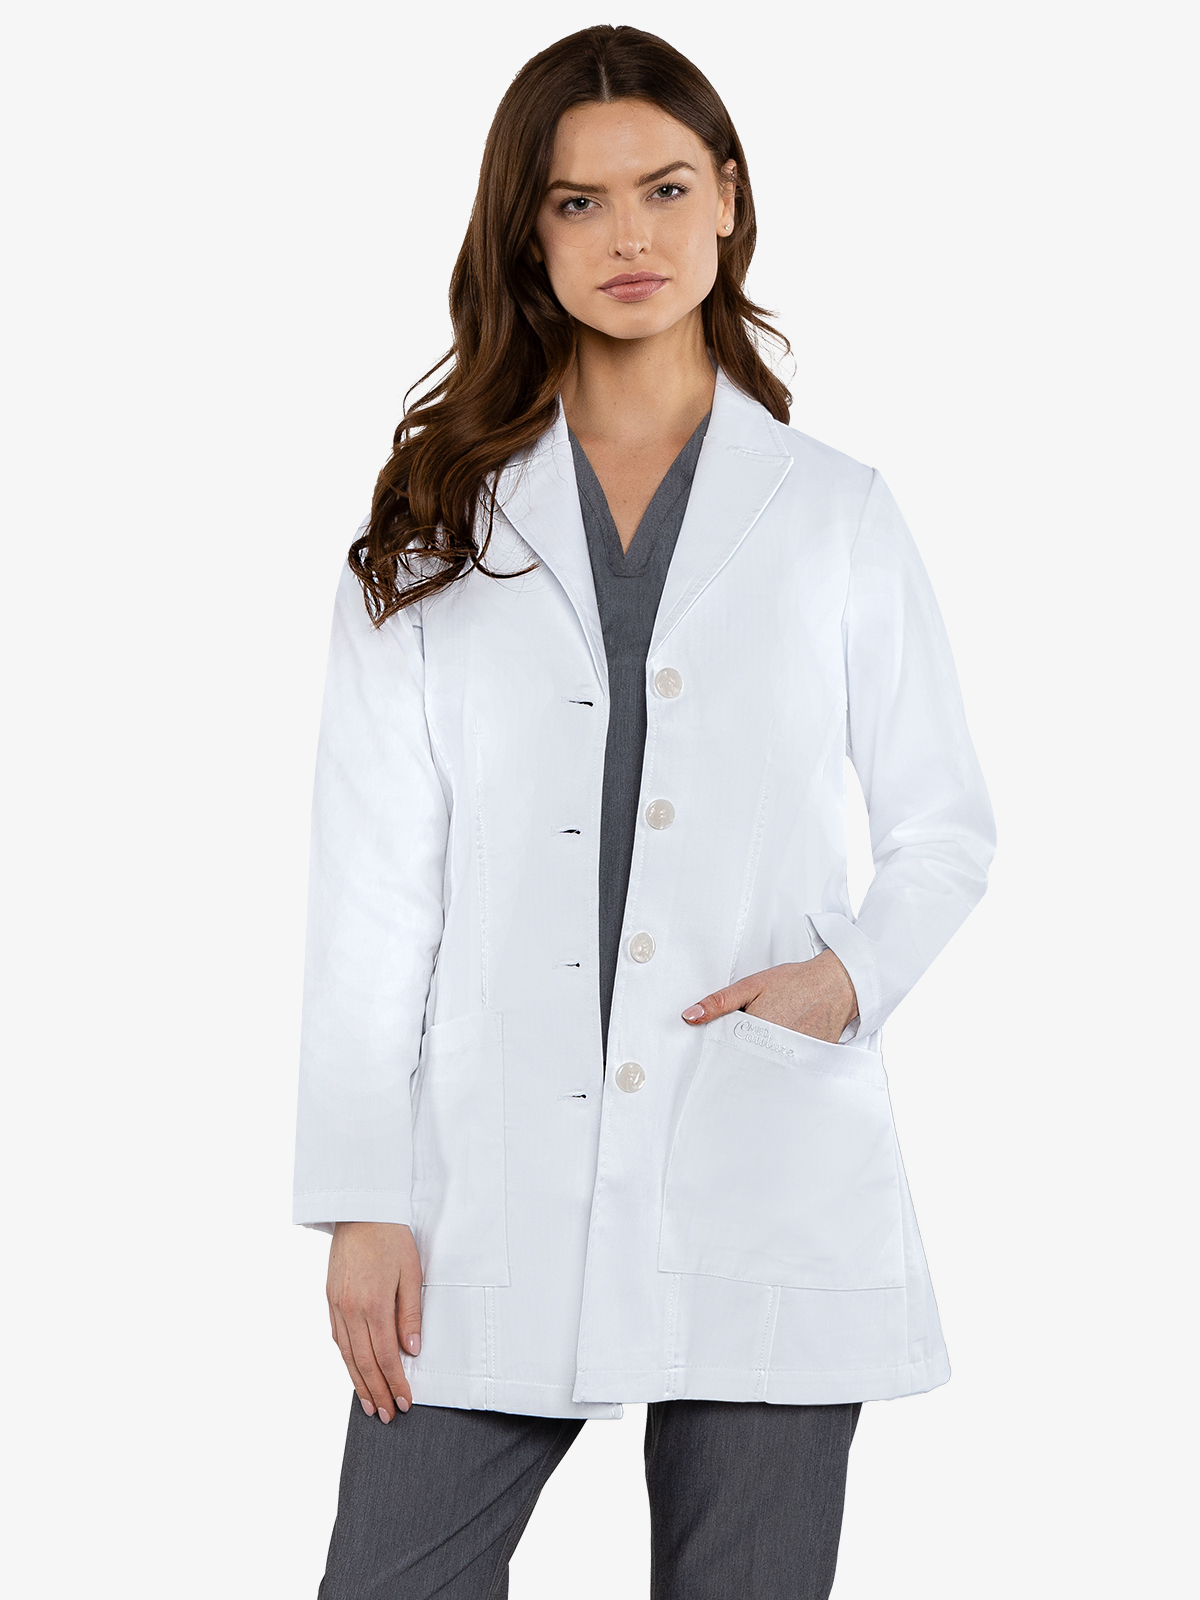 Premium Lab Wear, Tailored Mid Length | 9644